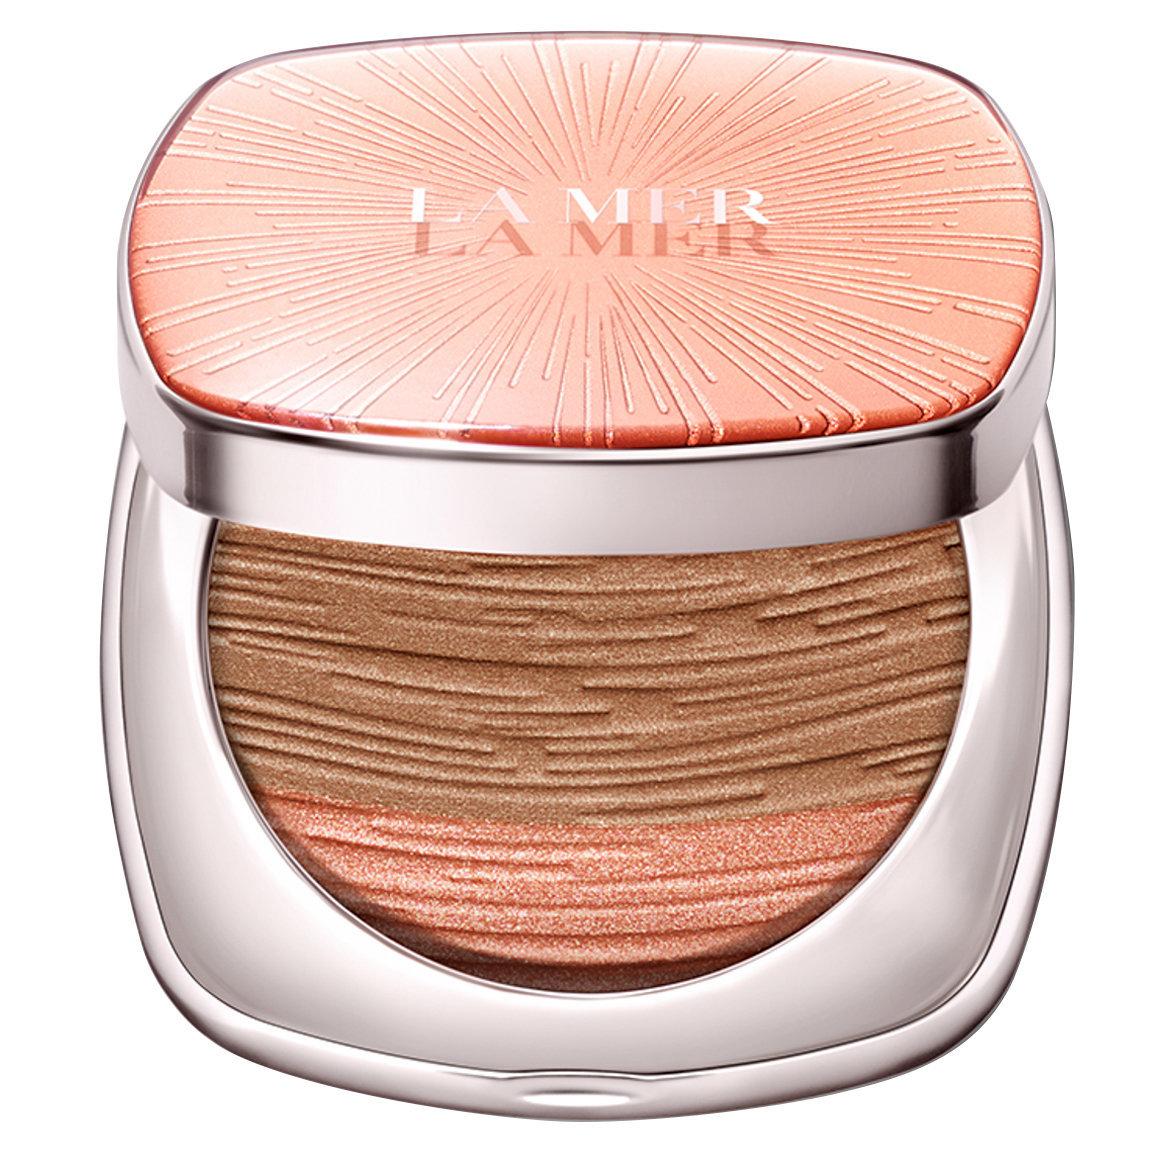 La Mer The Bronzing Powder alternative view 1 - product swatch.